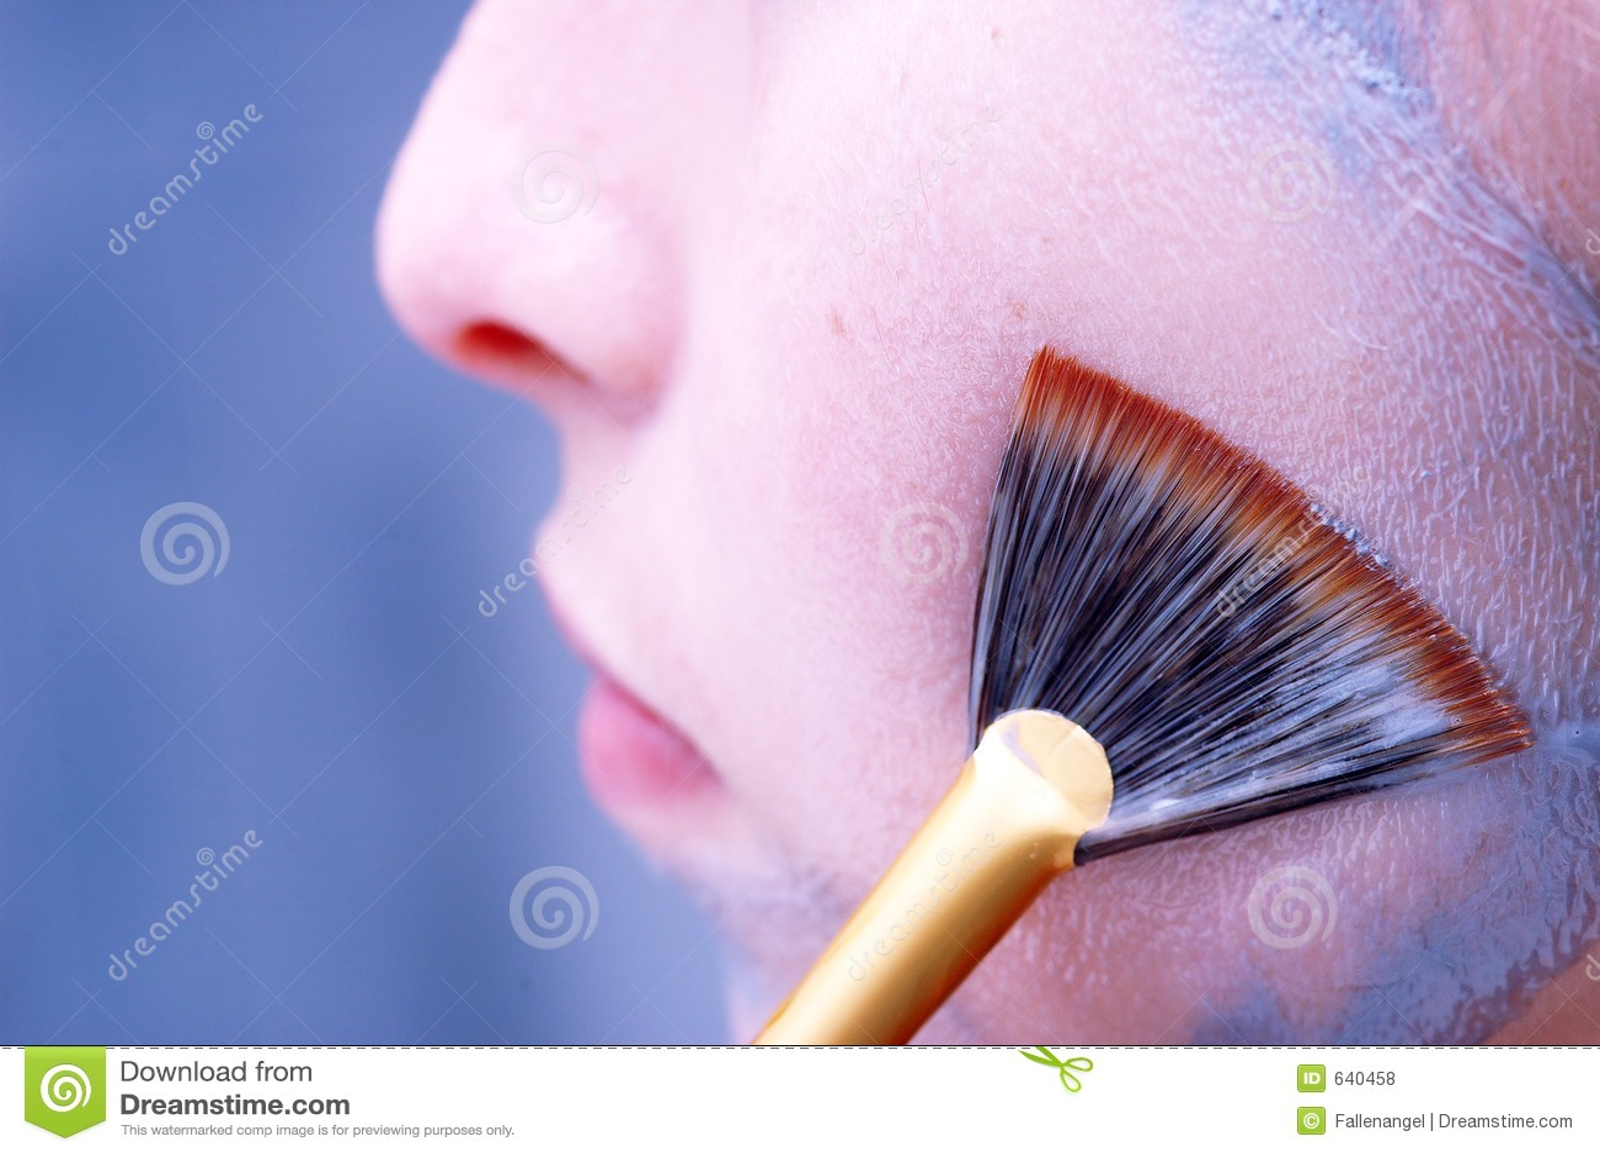 Limpando uma máscara protectora